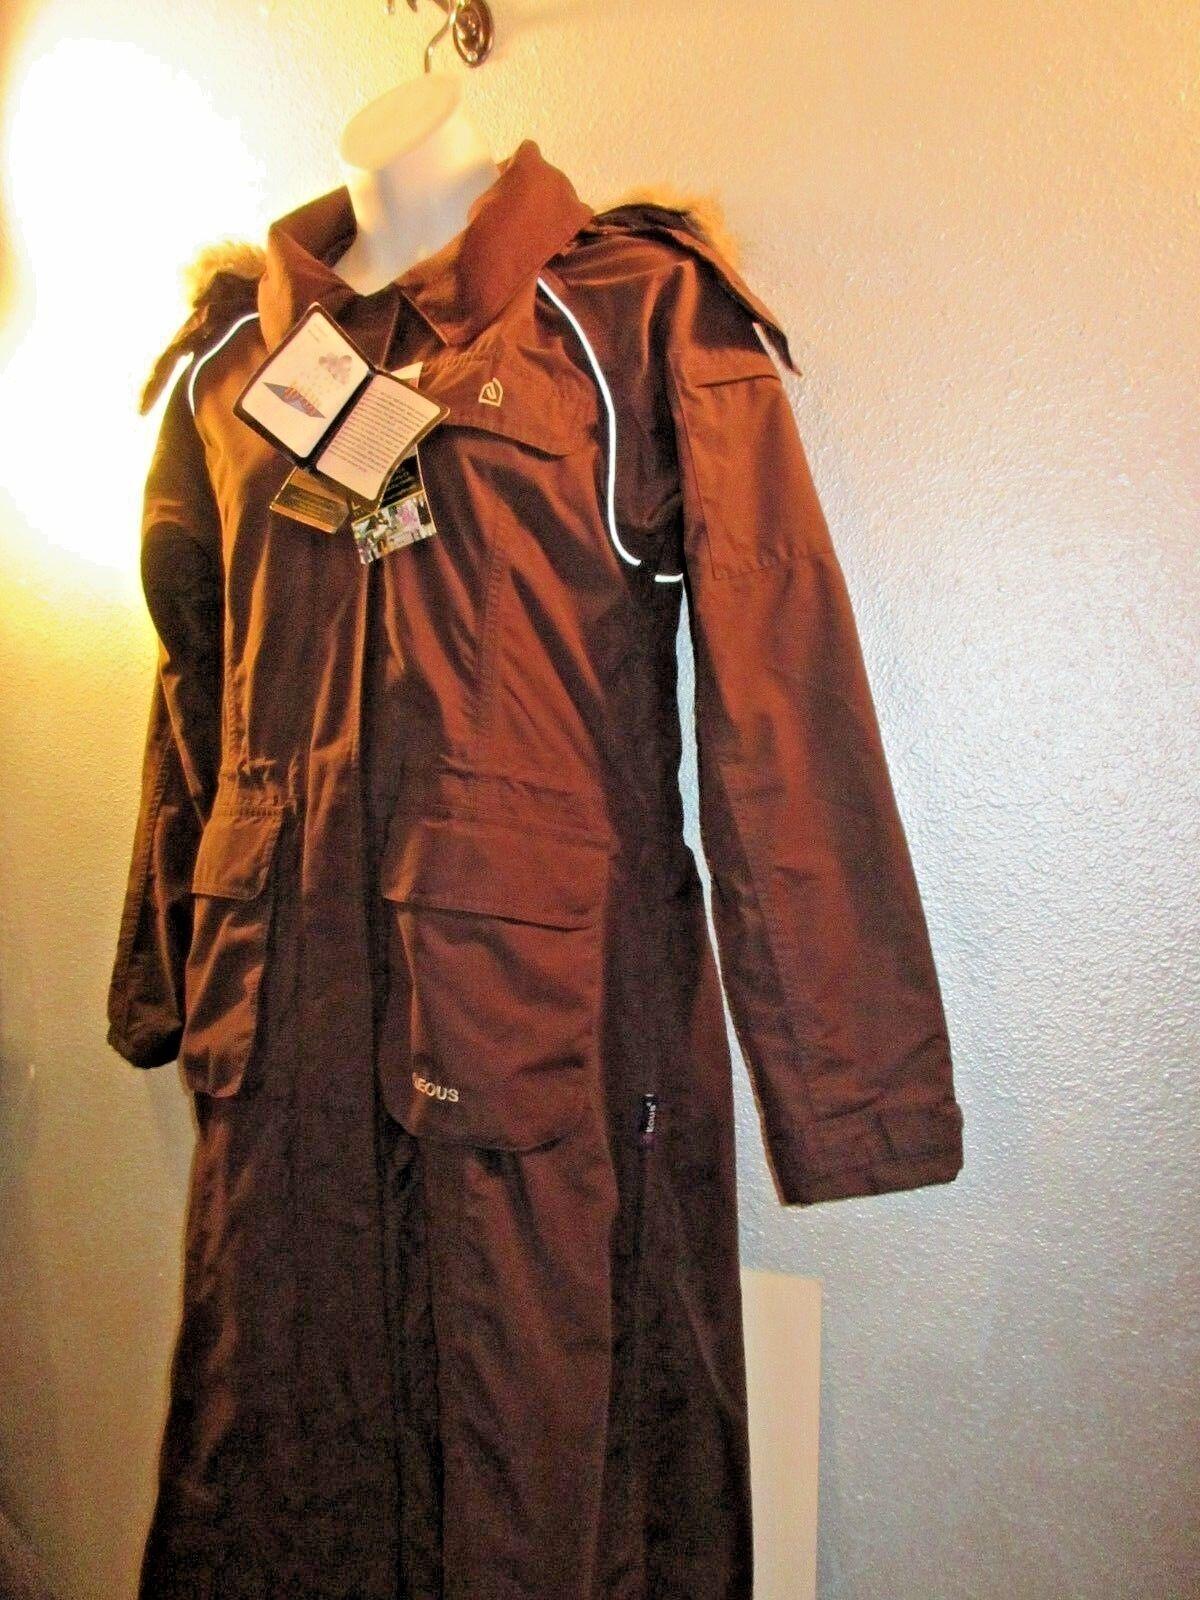 Equisupplies  eous  Riders Gabardina Abrigo marrón nuevo con etiquetas Capucha Desmontable Plus SZ XXL  +